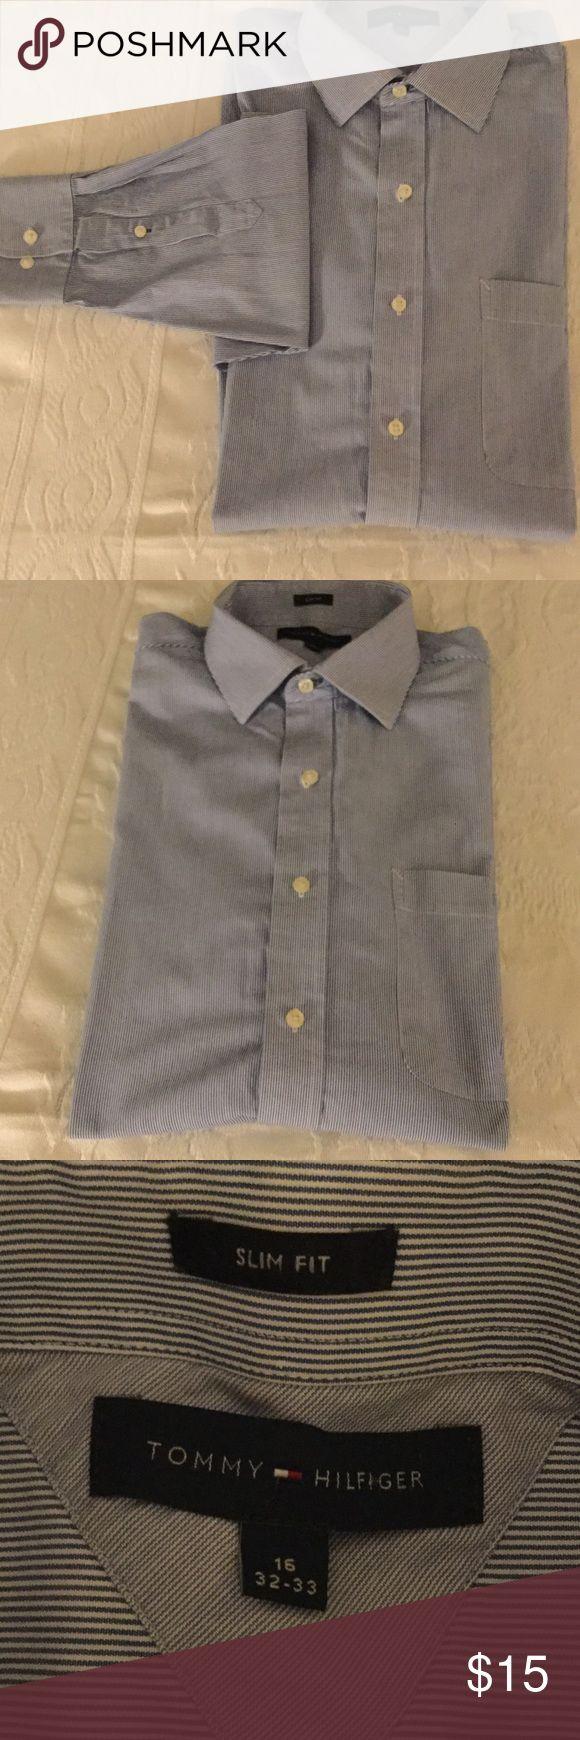 Tommy Hilfiger Dress Shirt, Size 16, 32-33 Tommy Hilfiger Blue Pin Stripe Shirt, Size 16, 32-33, gently worn Tommy Hilfiger Shirts Dress Shirts